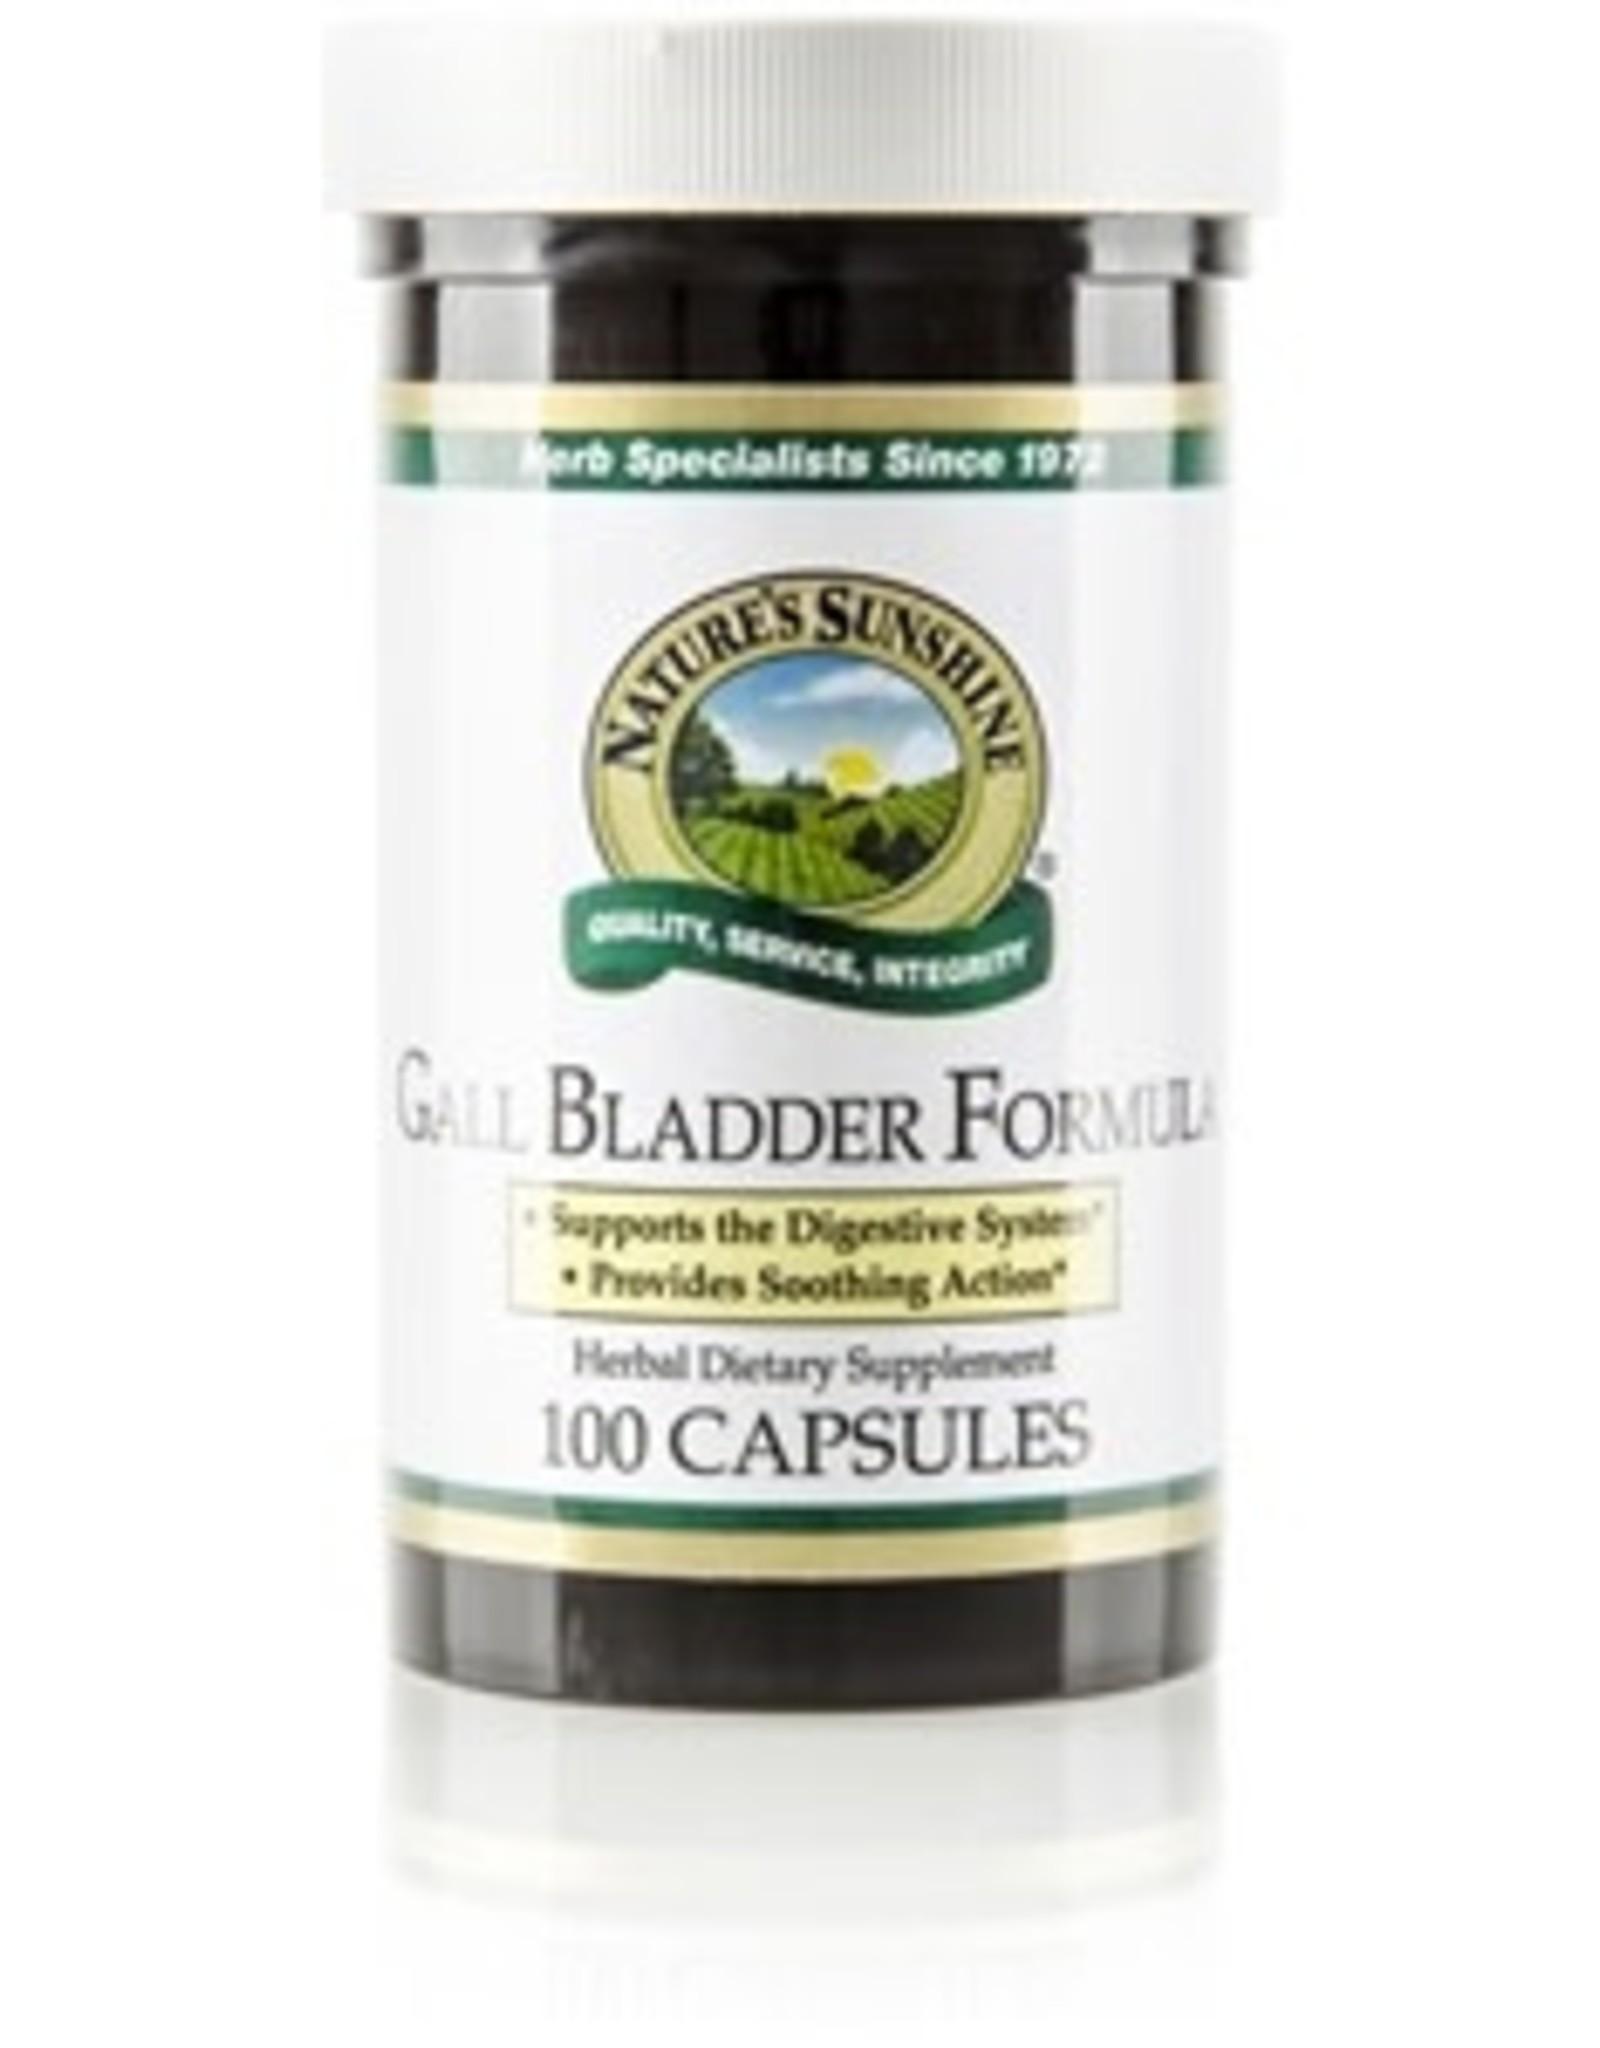 Nature's Sunshine Gall Bladder Formula (100 caps)*